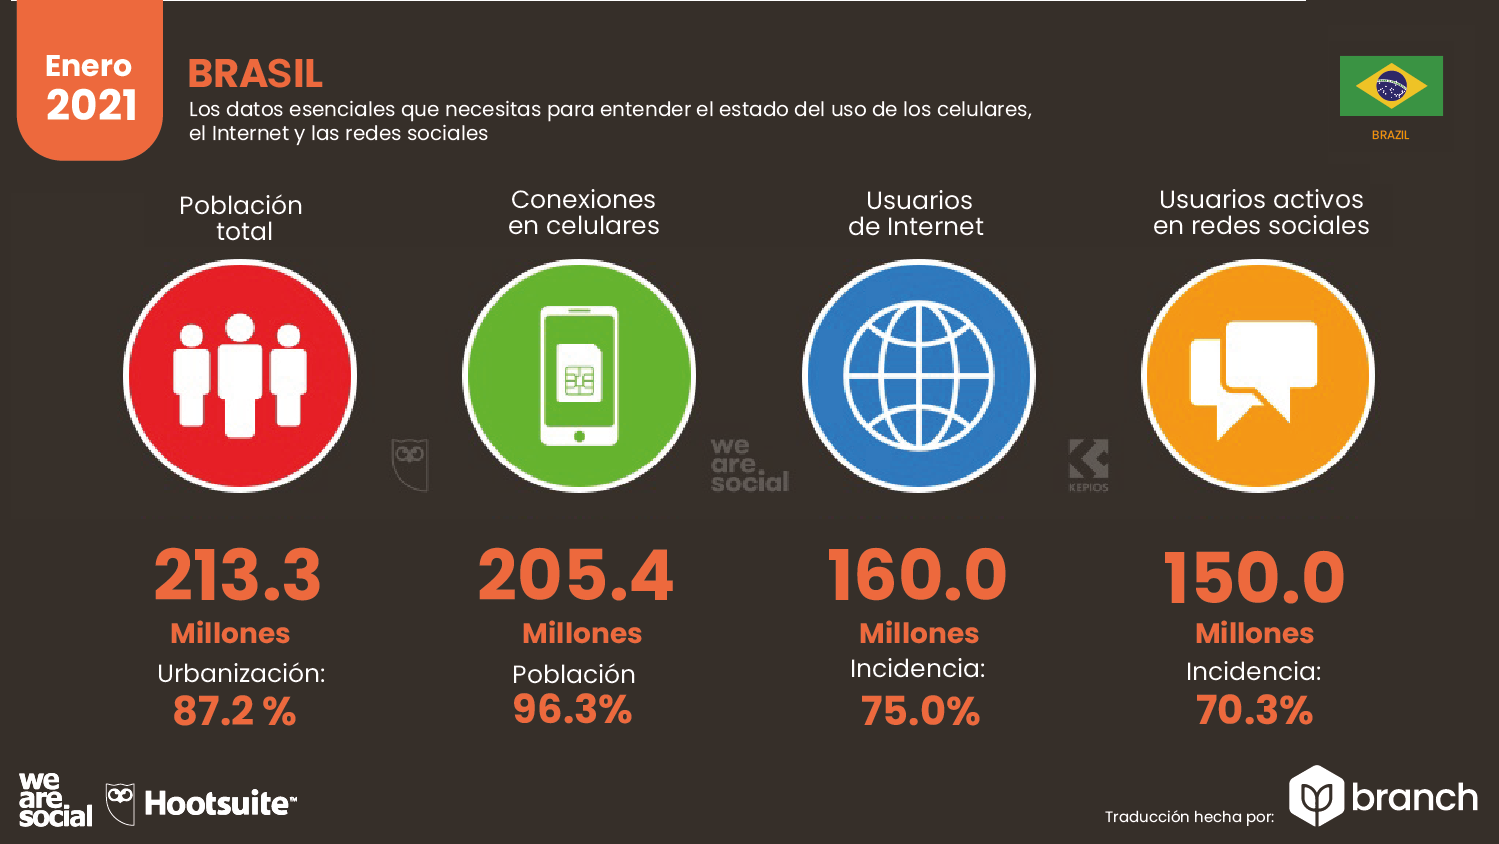 estadisticas-de-la-situacion-digital-de-brasil-2020-2021